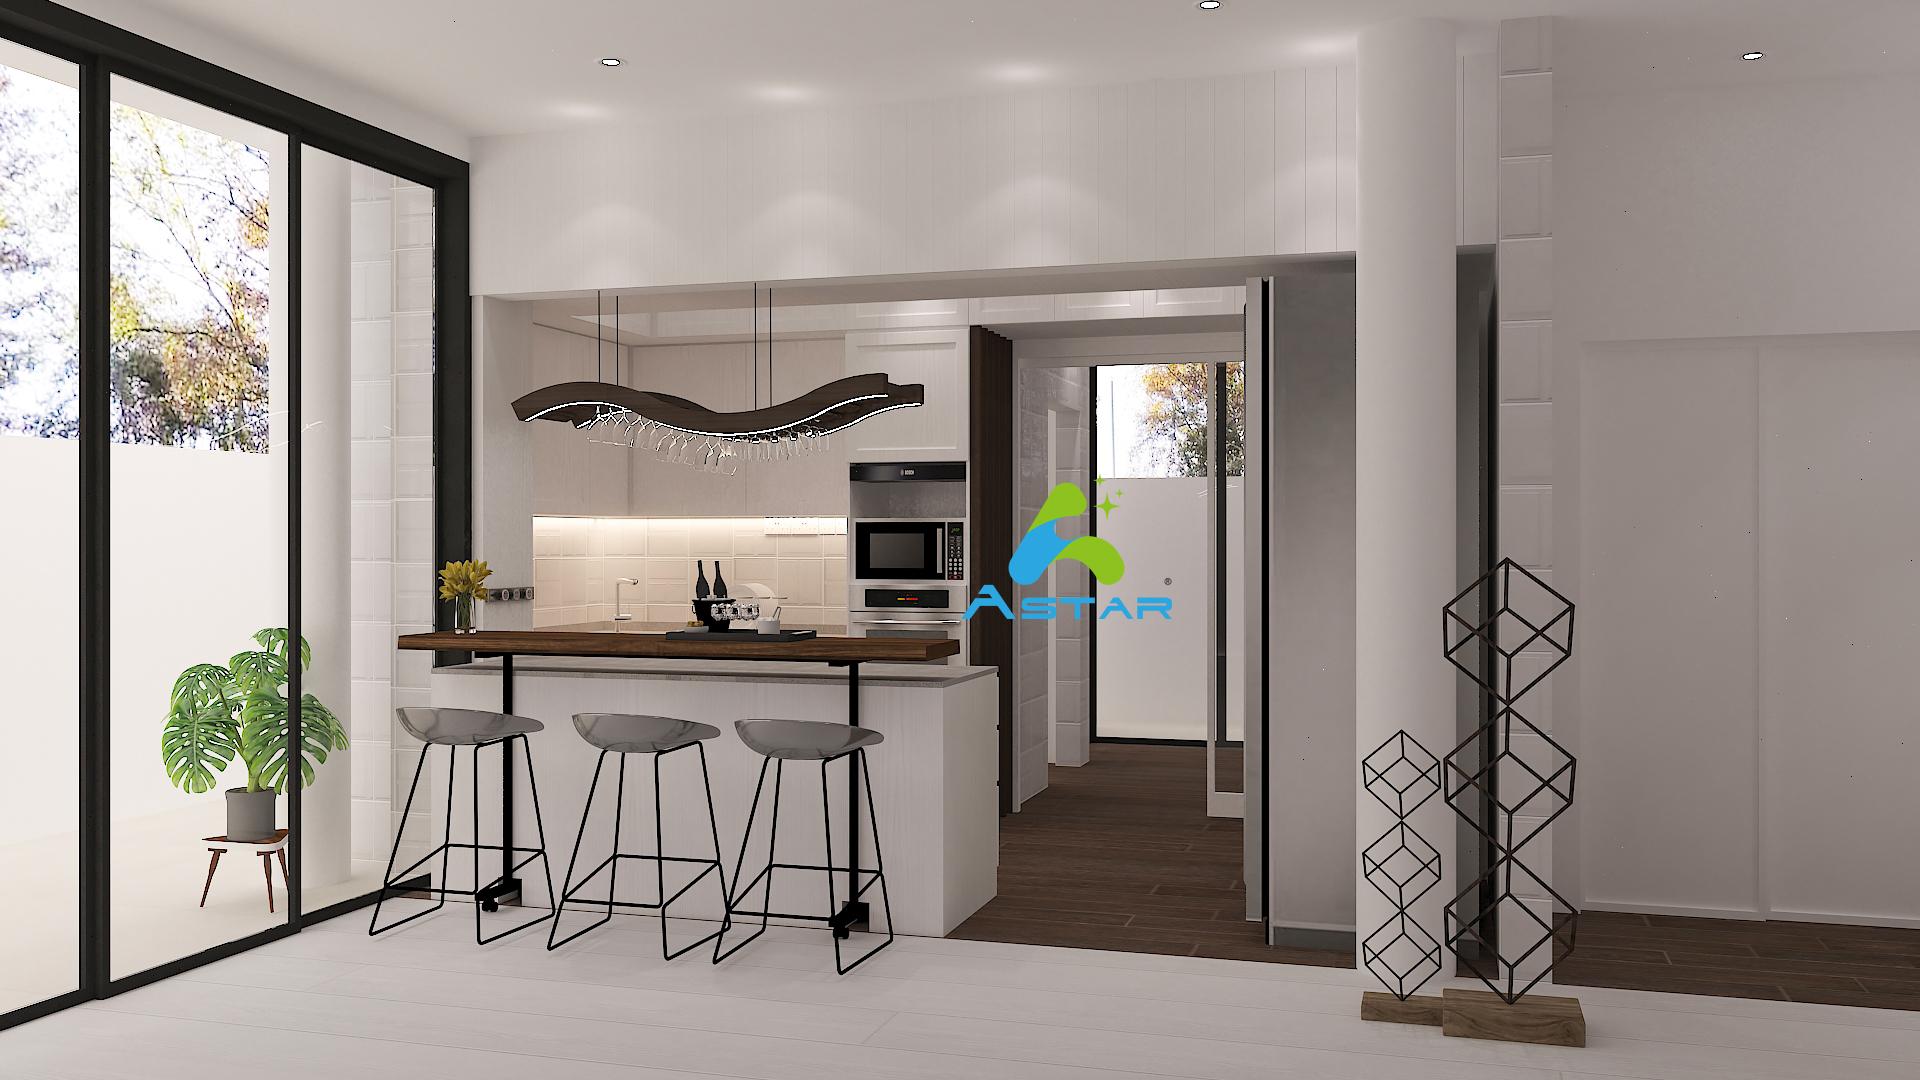 astar furnishing aluminum furniture projects Ettrick Terrace 1